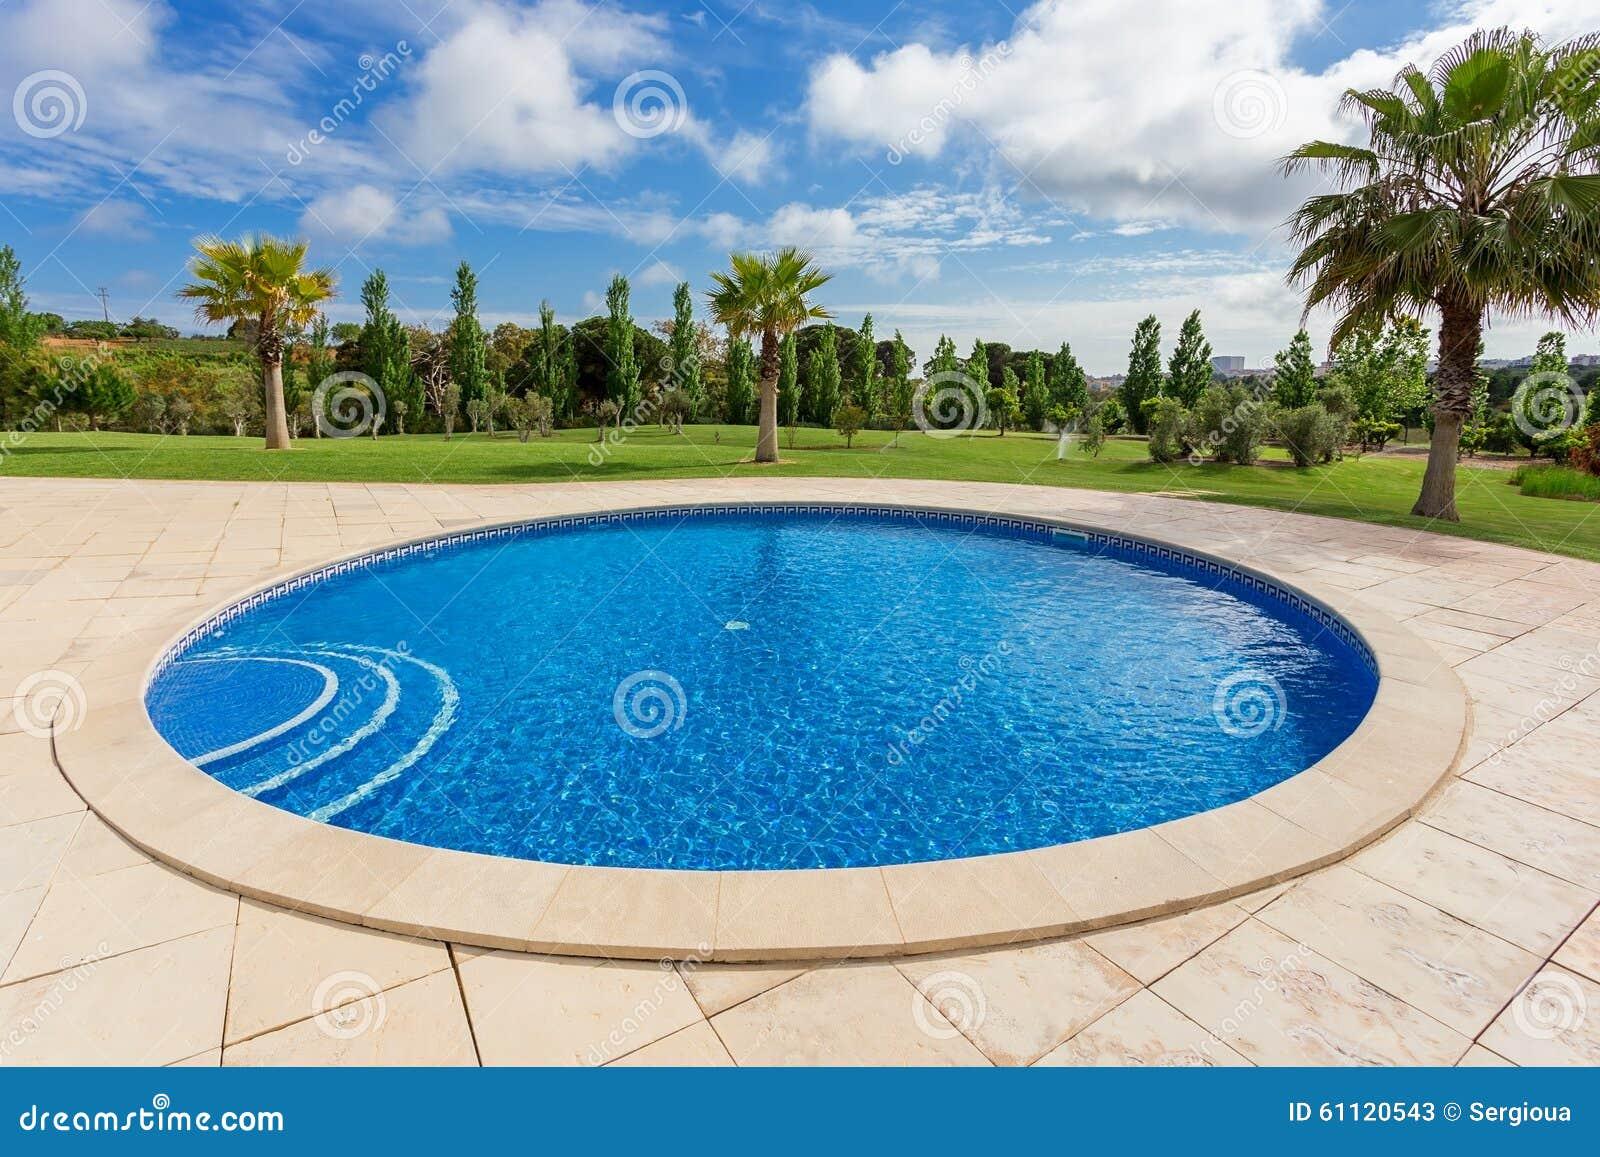 Piscina redonda moderna en las zonas tropicales cerca del for Piscina redonda grande